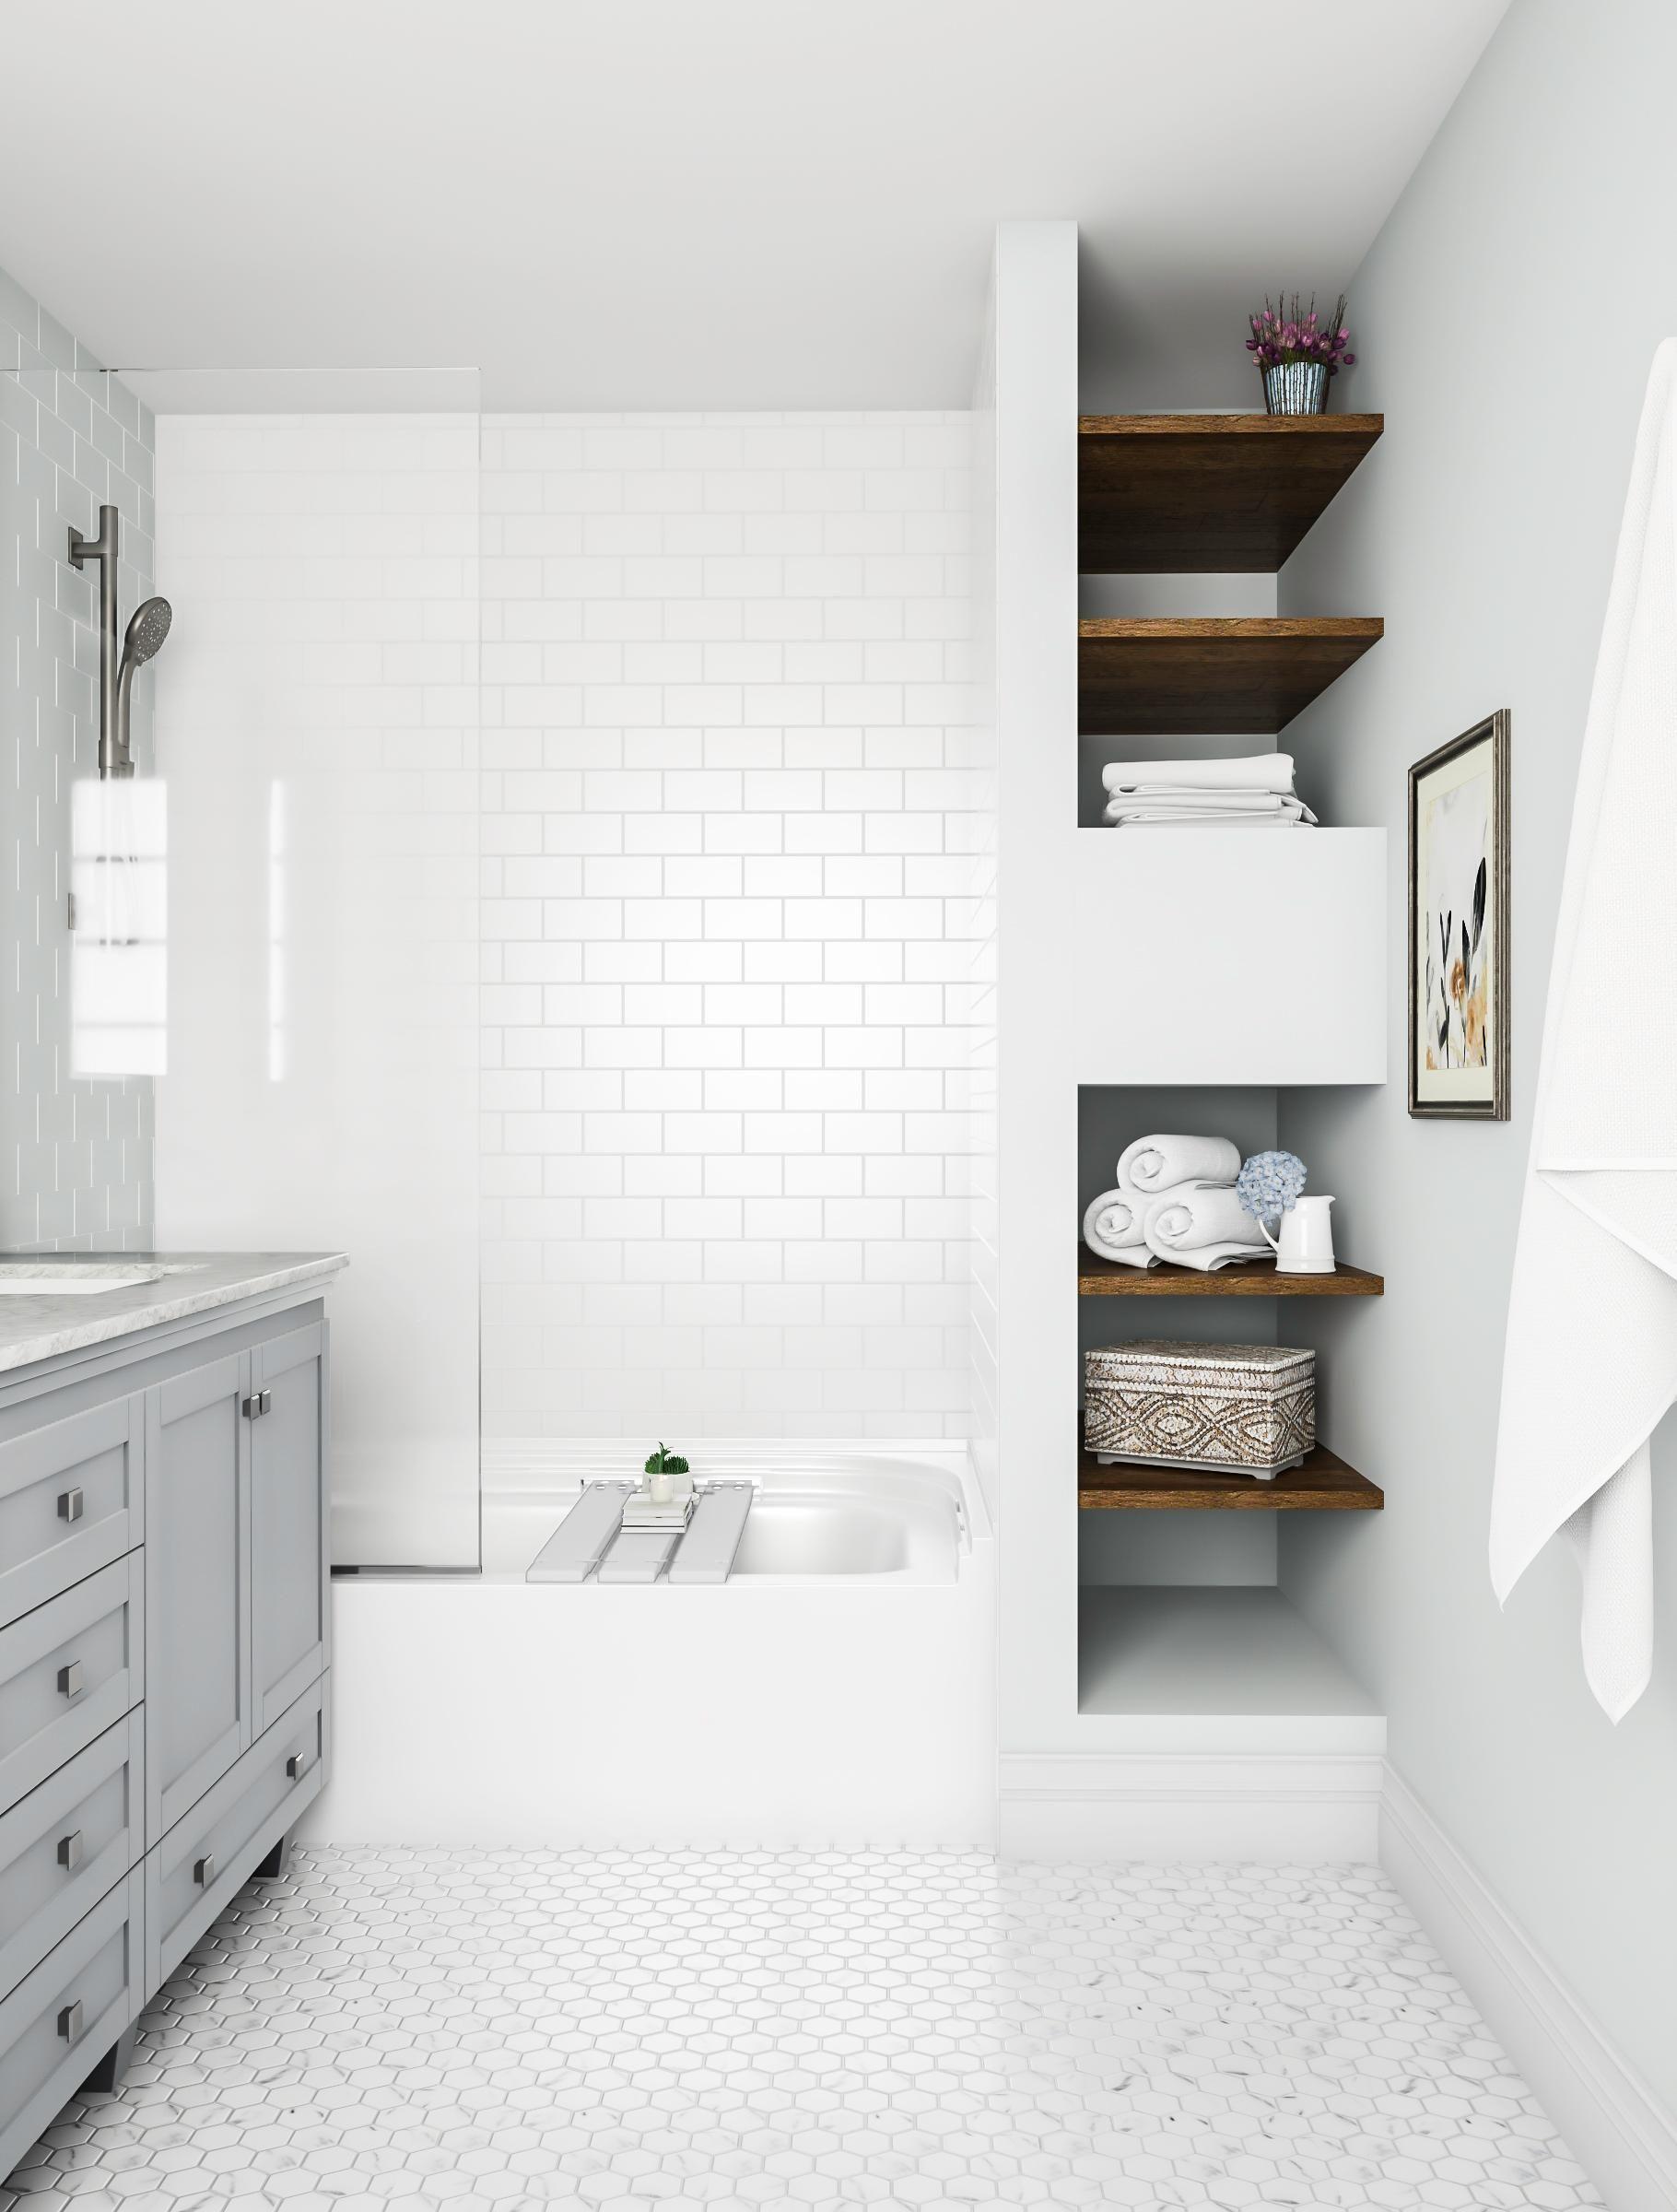 Classic White Tile Bathroom White Bathroom Tiles All White Bathroom Small Bathroom Remodel